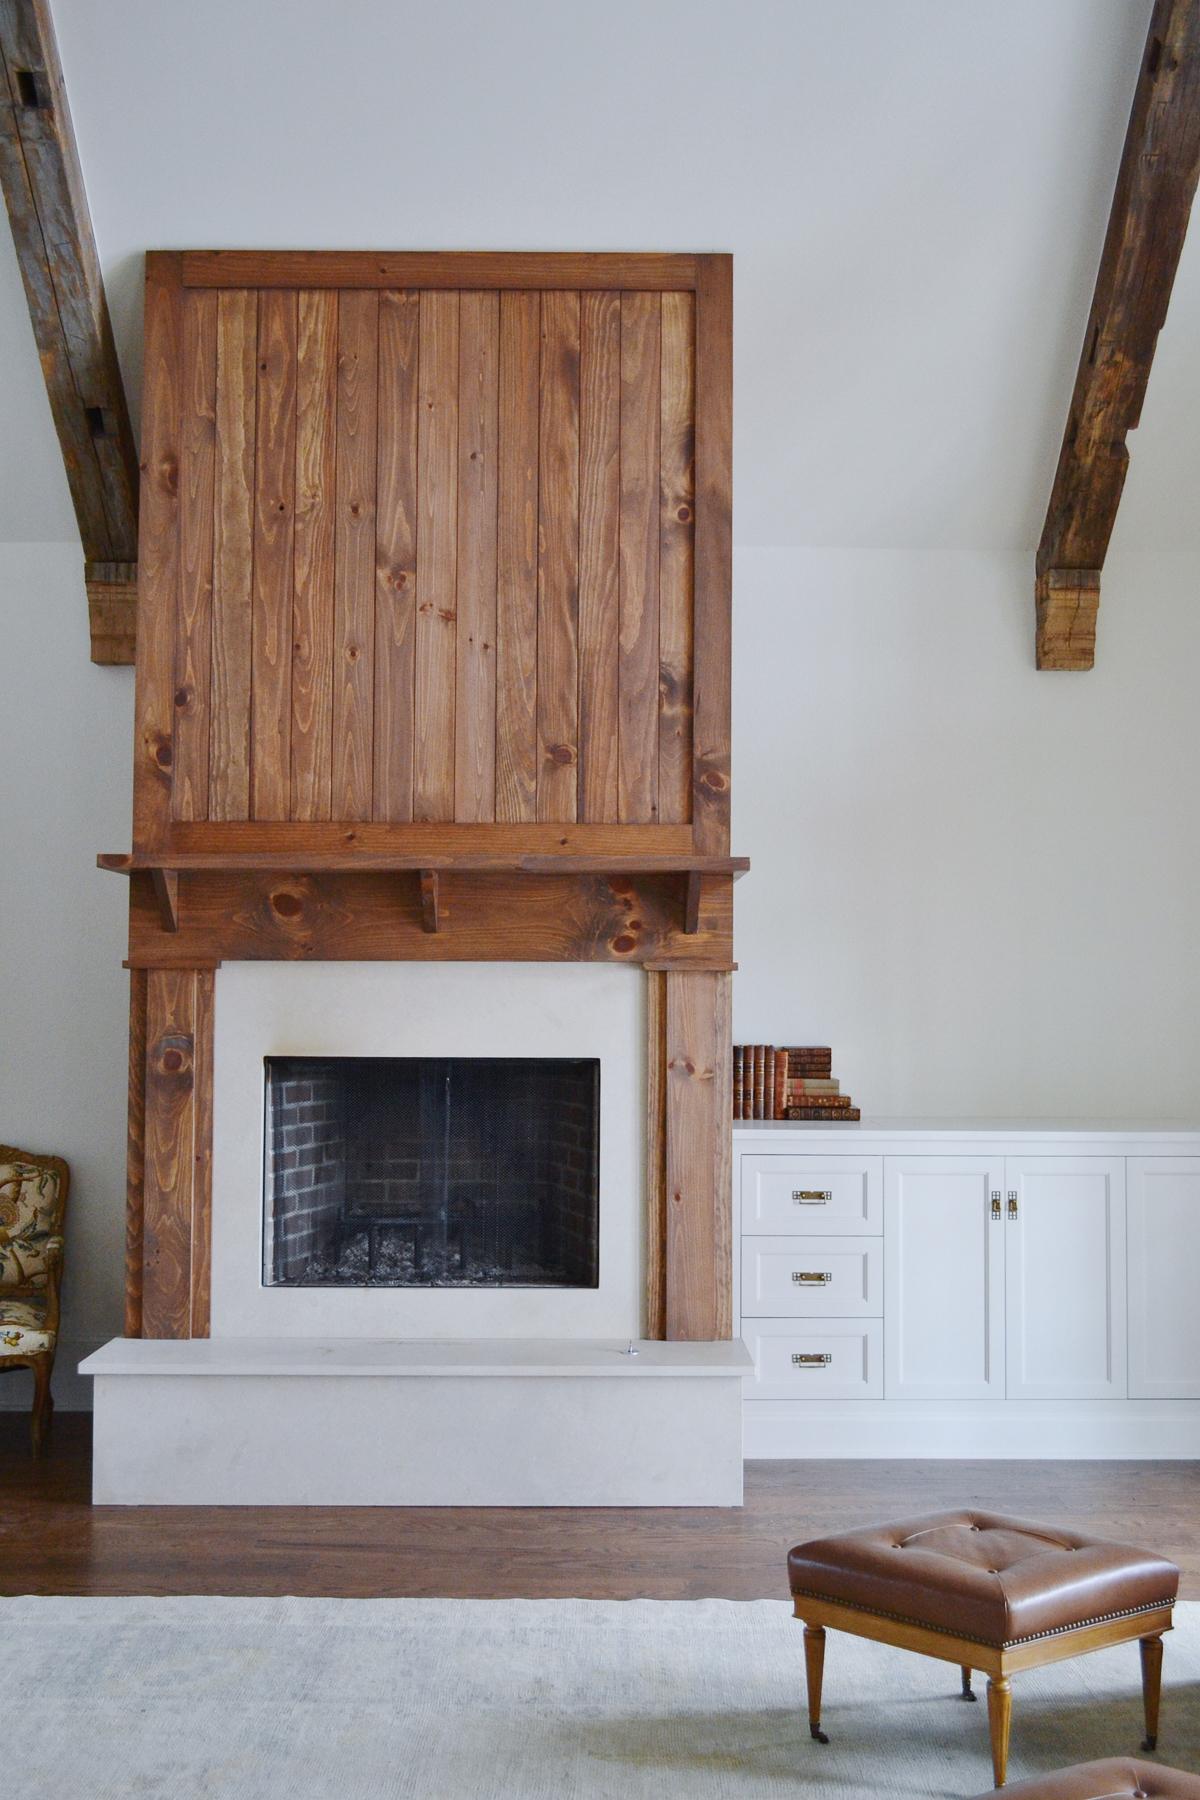 interior Lake Oconee lake house wood overmantel fireplace.jpg